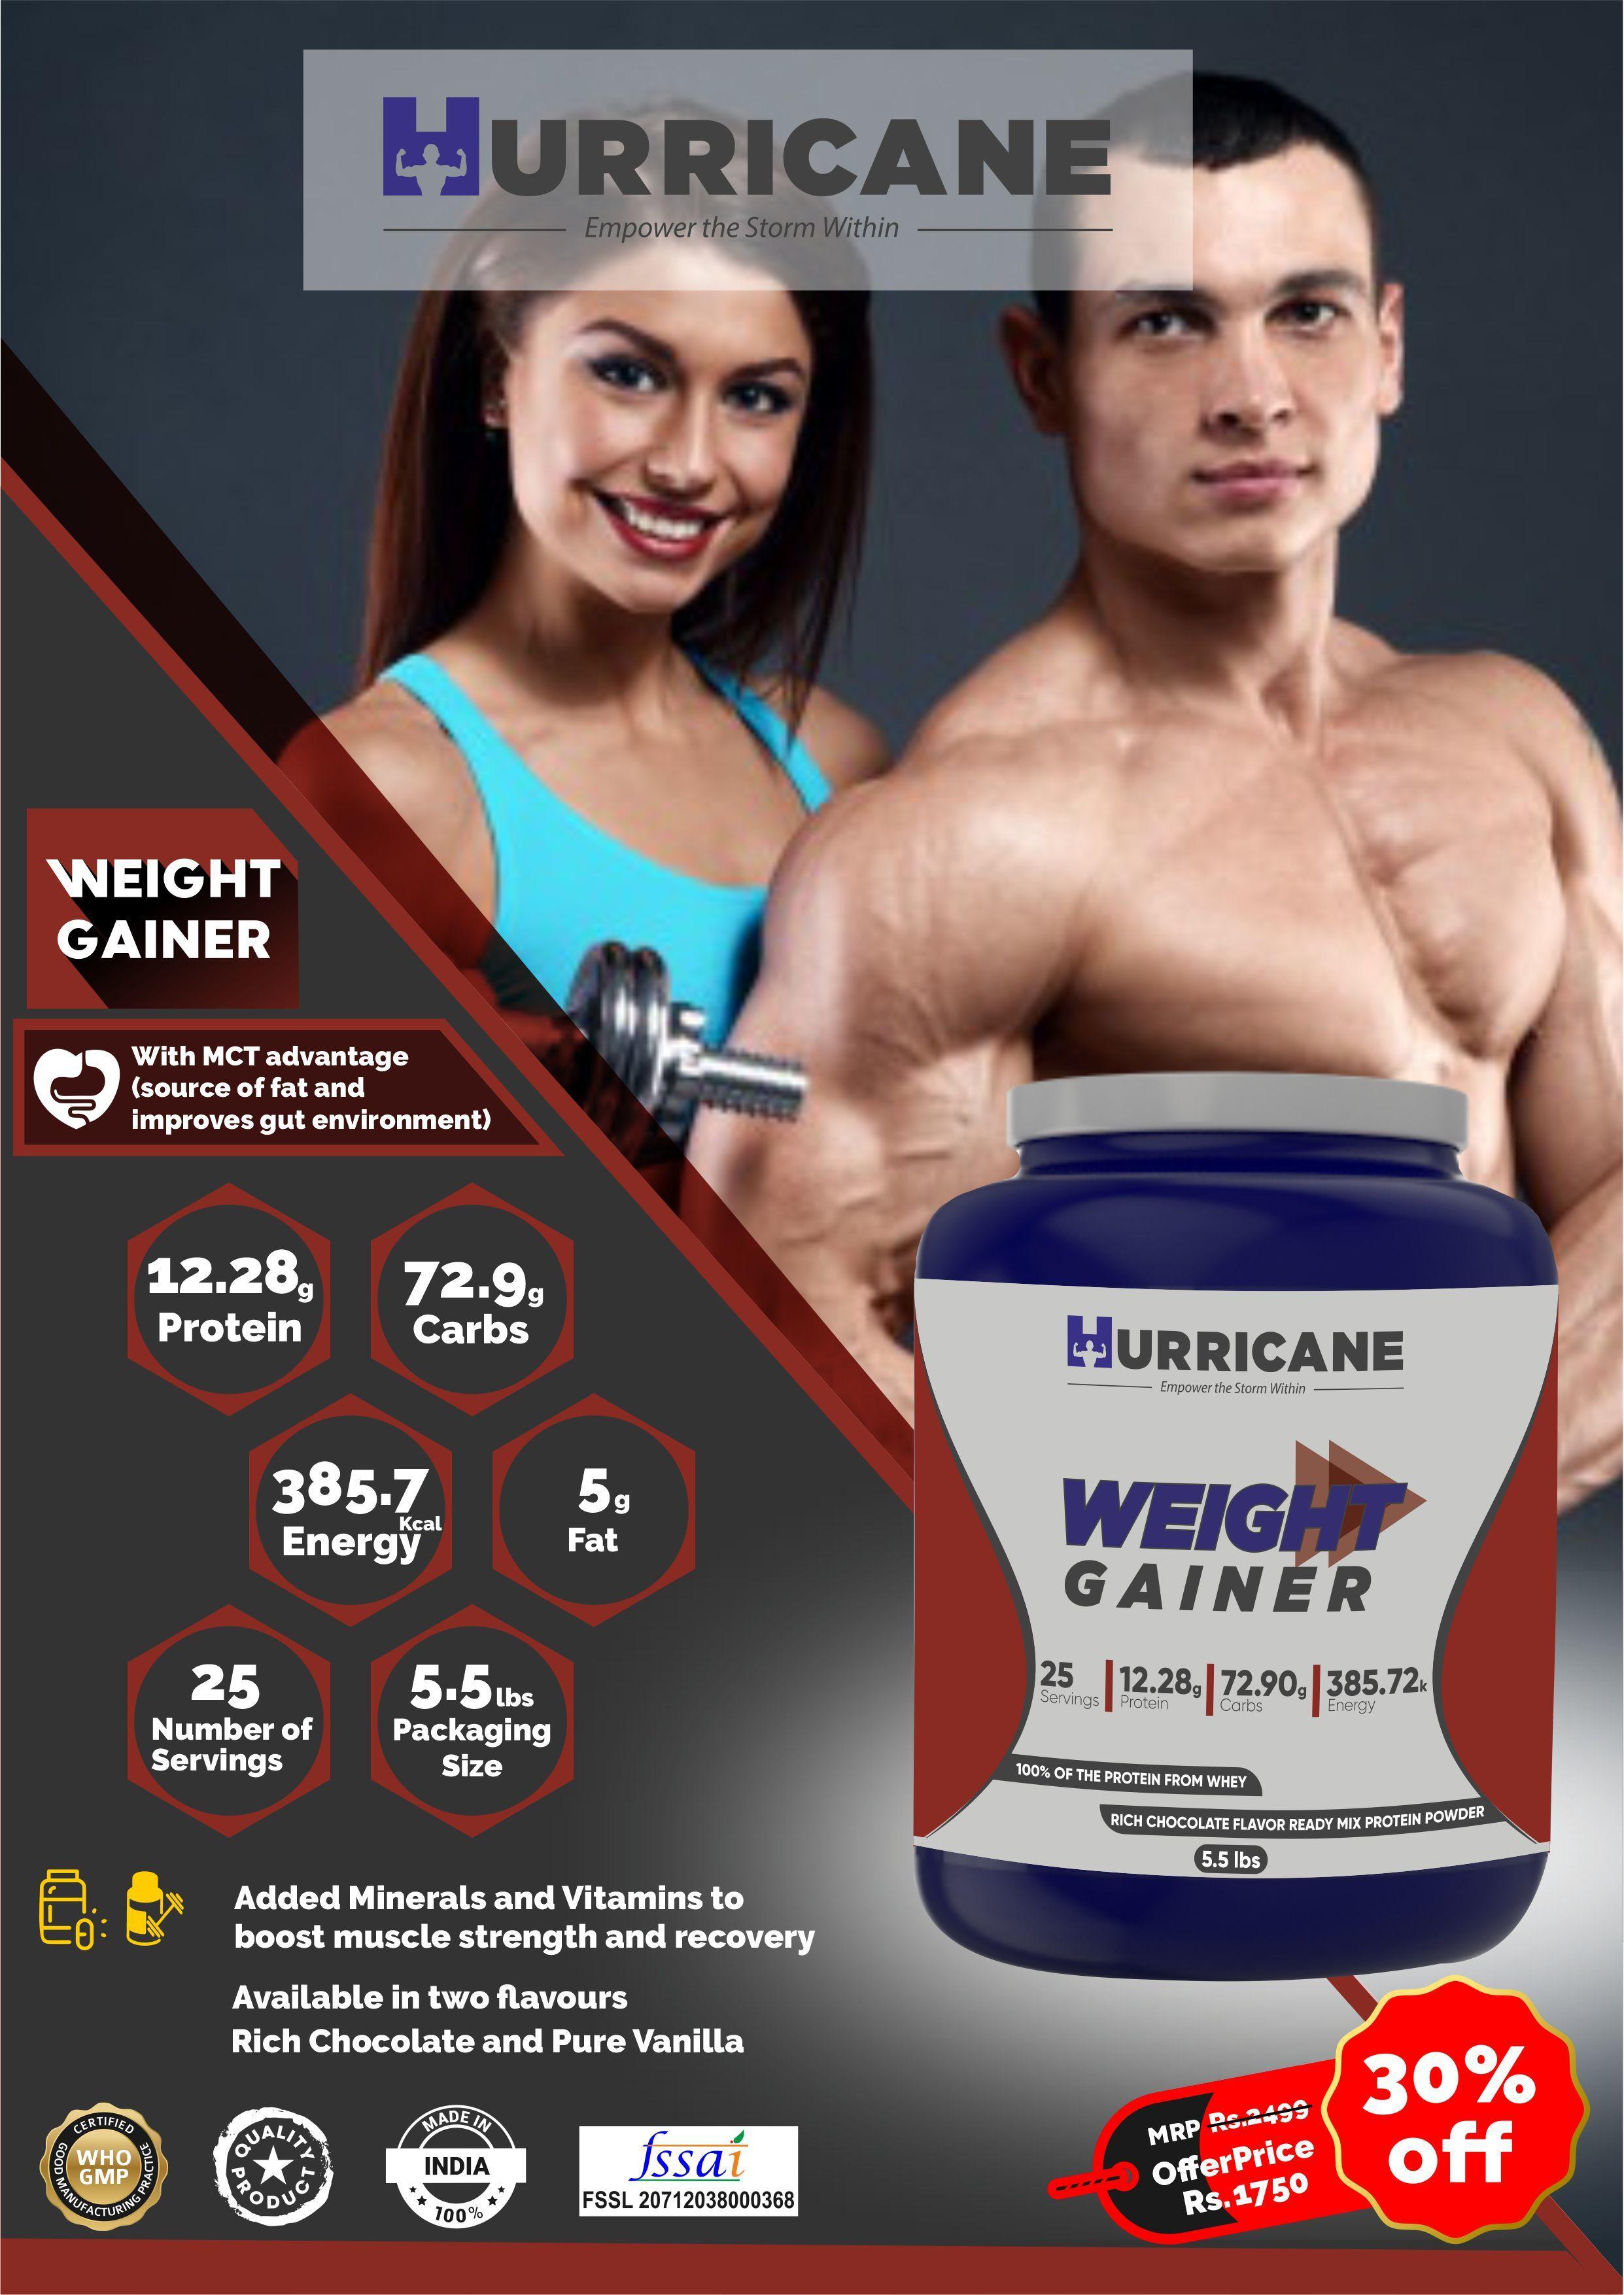 Hurricane Weight Gainer - Chocolate Flavour